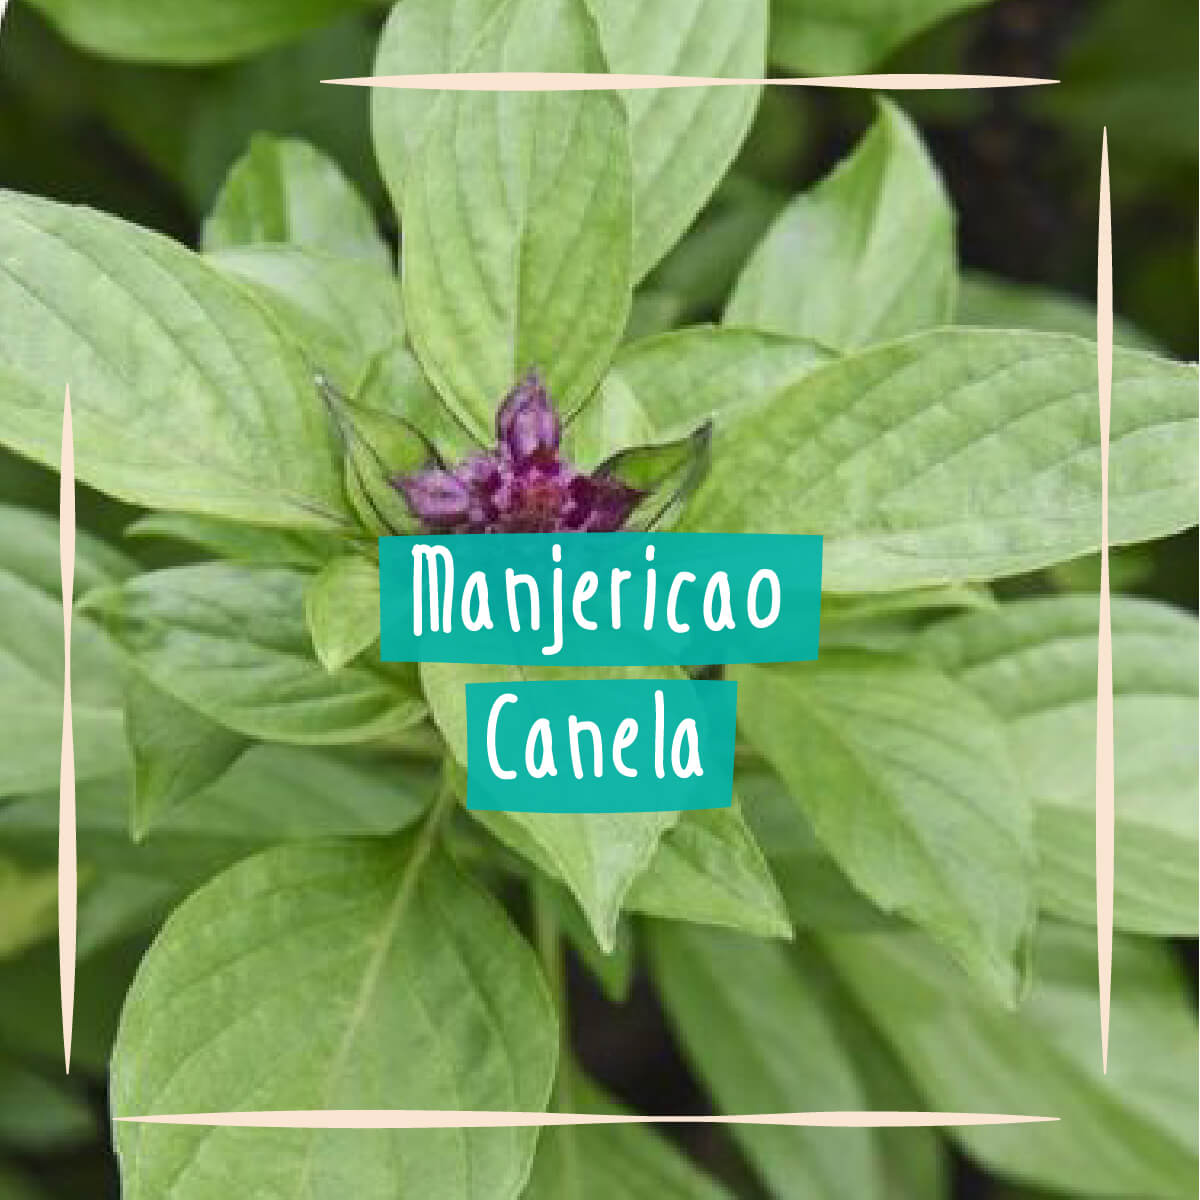 Sementes para plantar Manjericão Canela em vasos autoirrigáveis RAIZ  - Vasos Raiz Loja Oficial